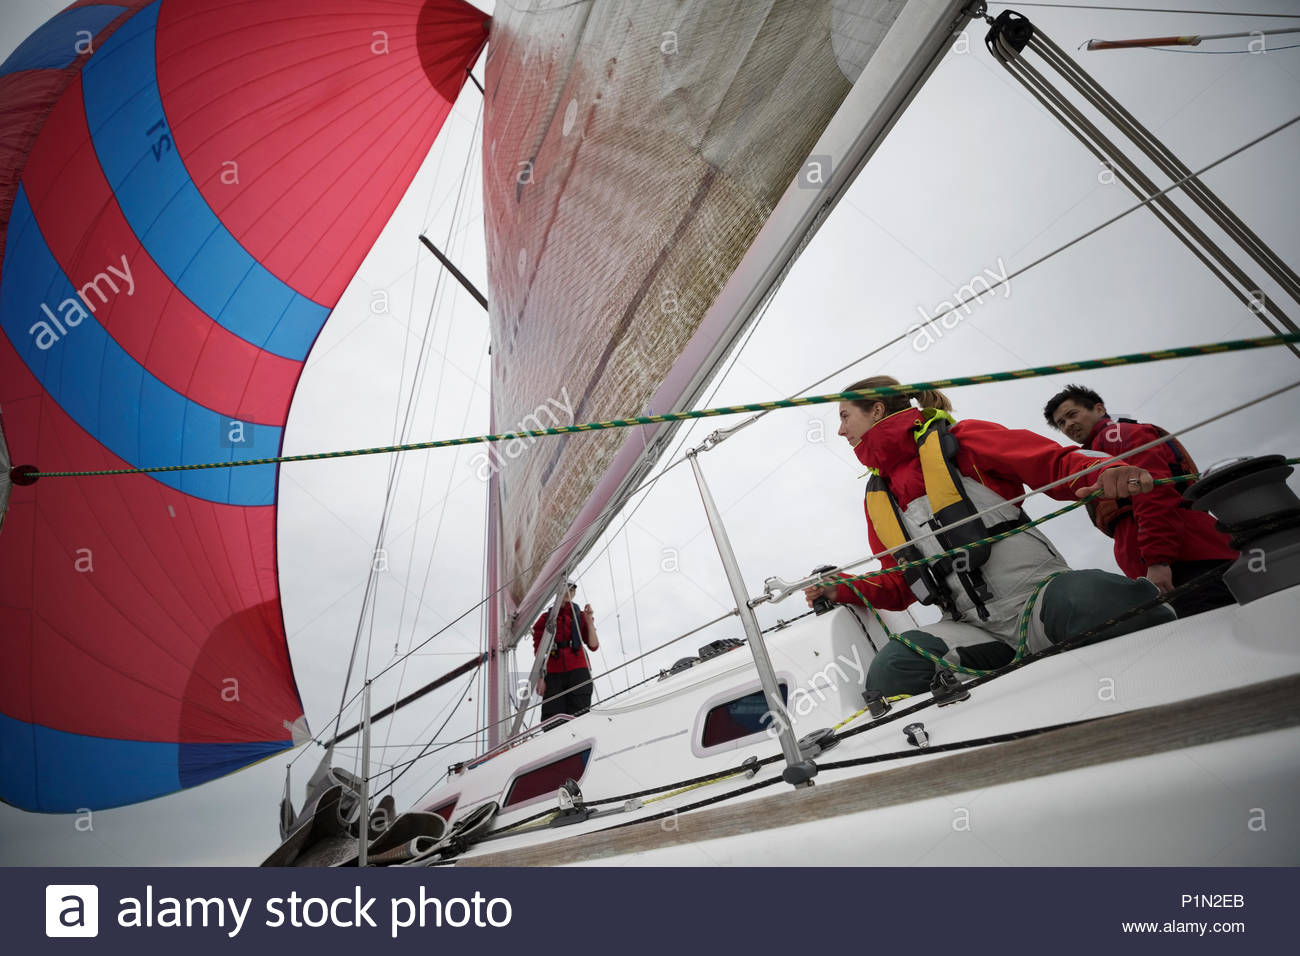 Sailing team adjusting sail on sailboat - Stock Image